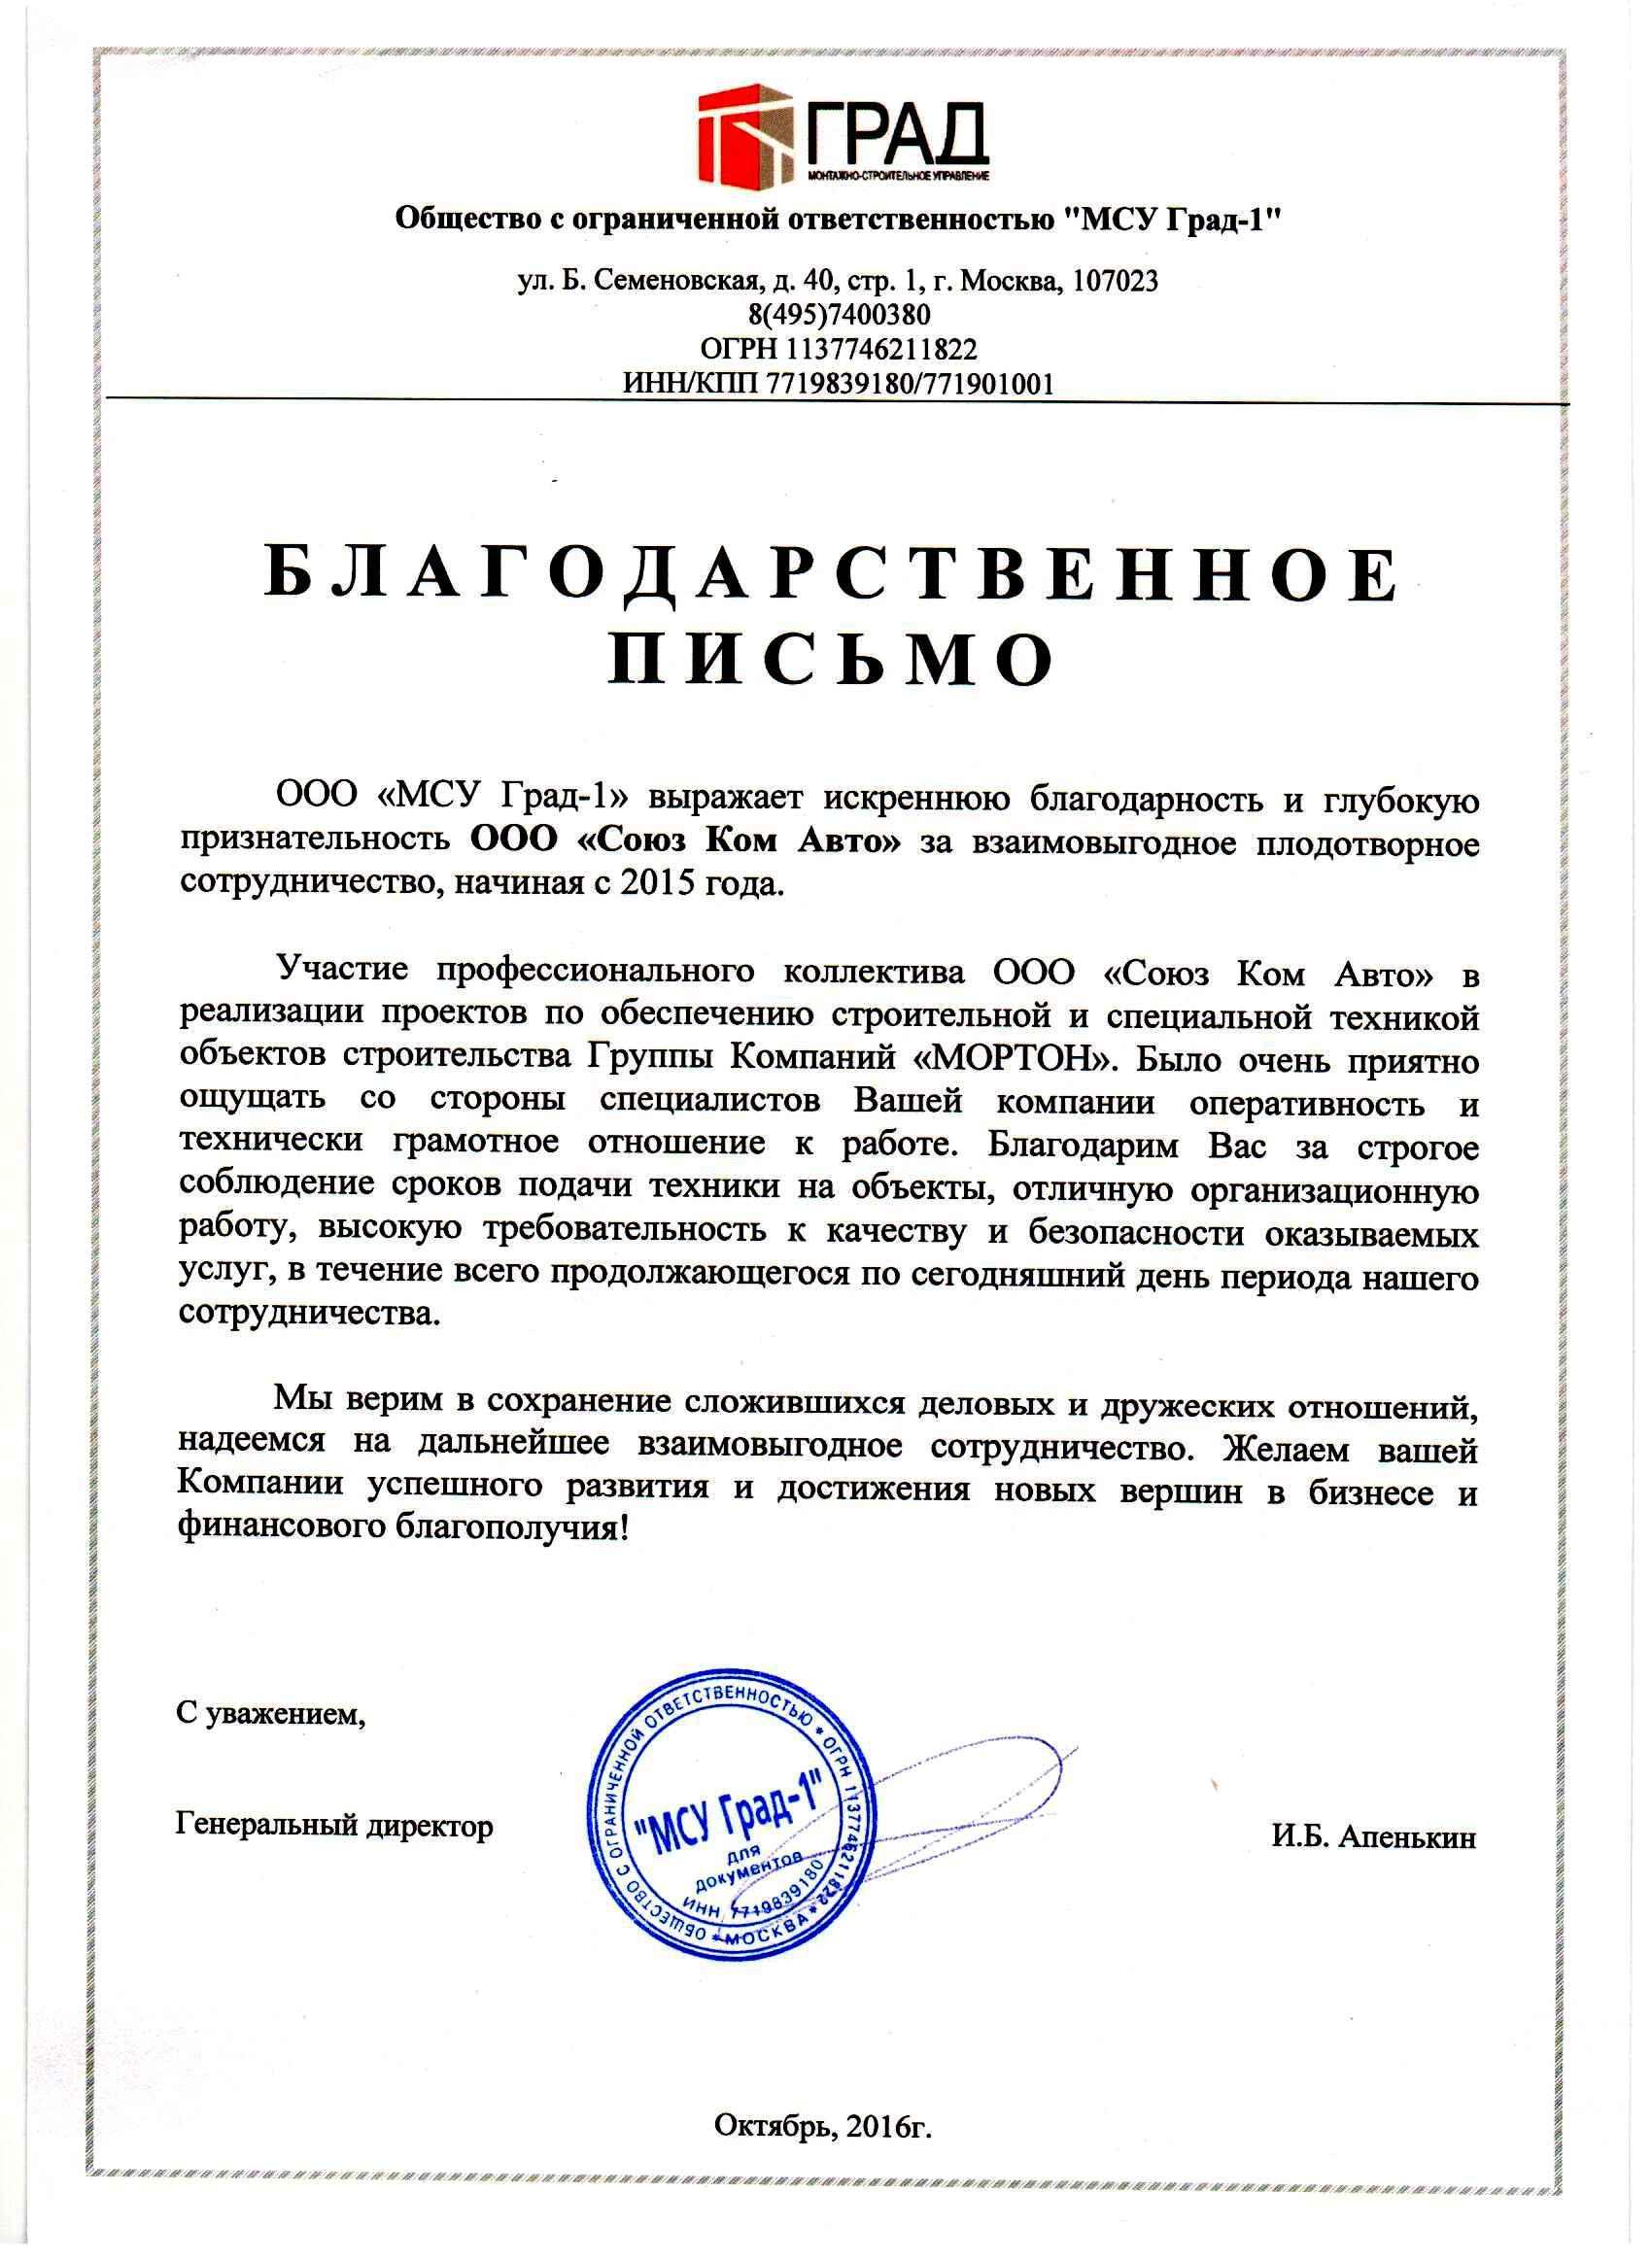 МСУ-Град-1-1610 (1)